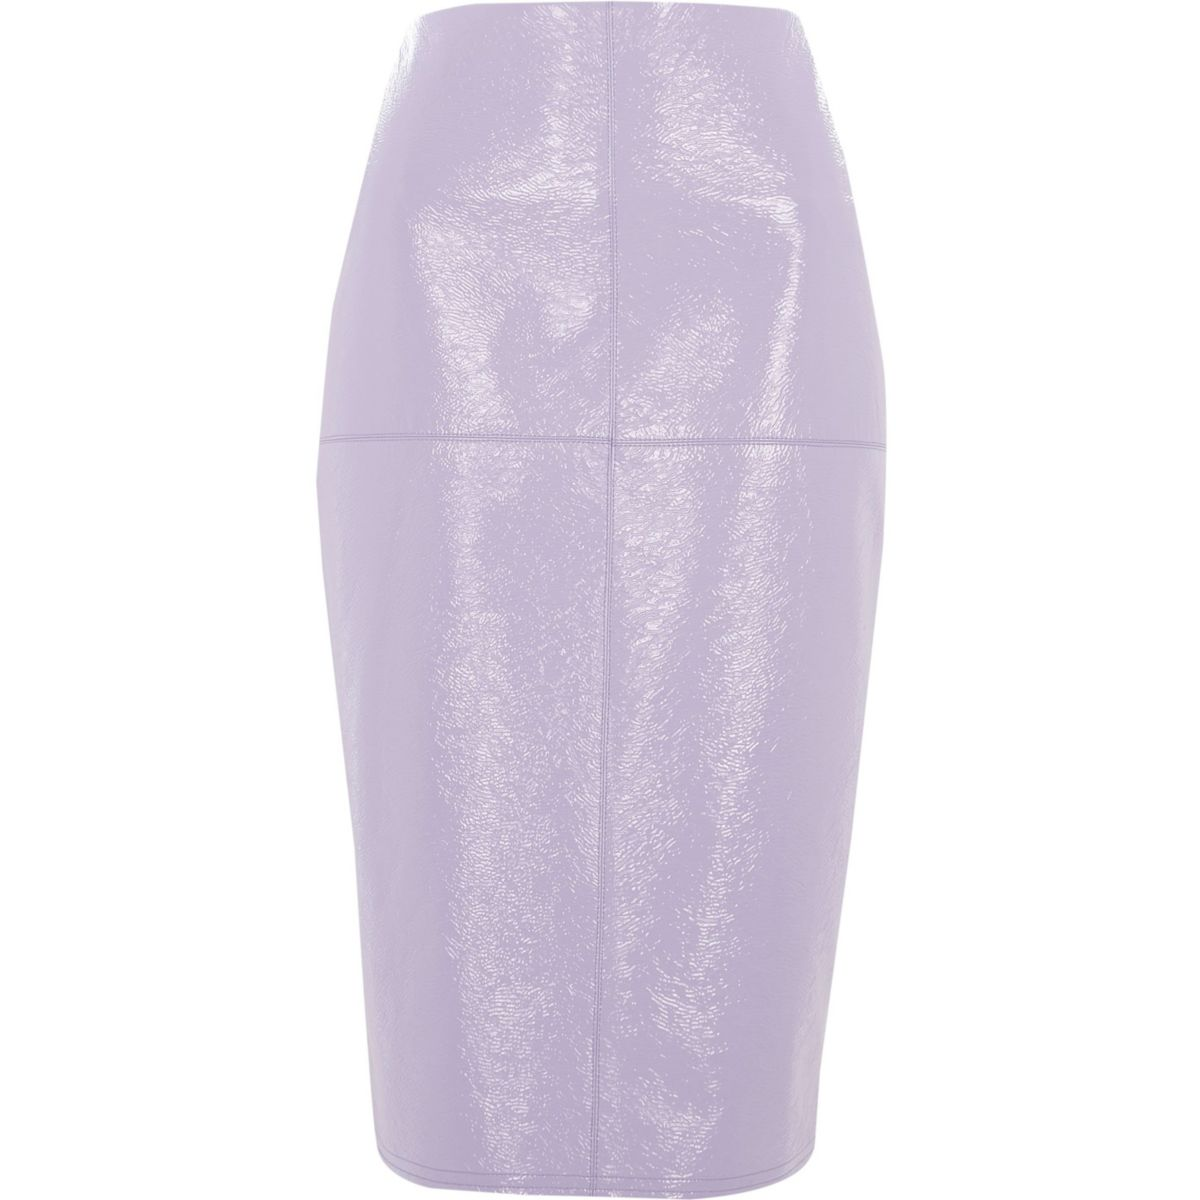 Light purple vinyl pencil skirt